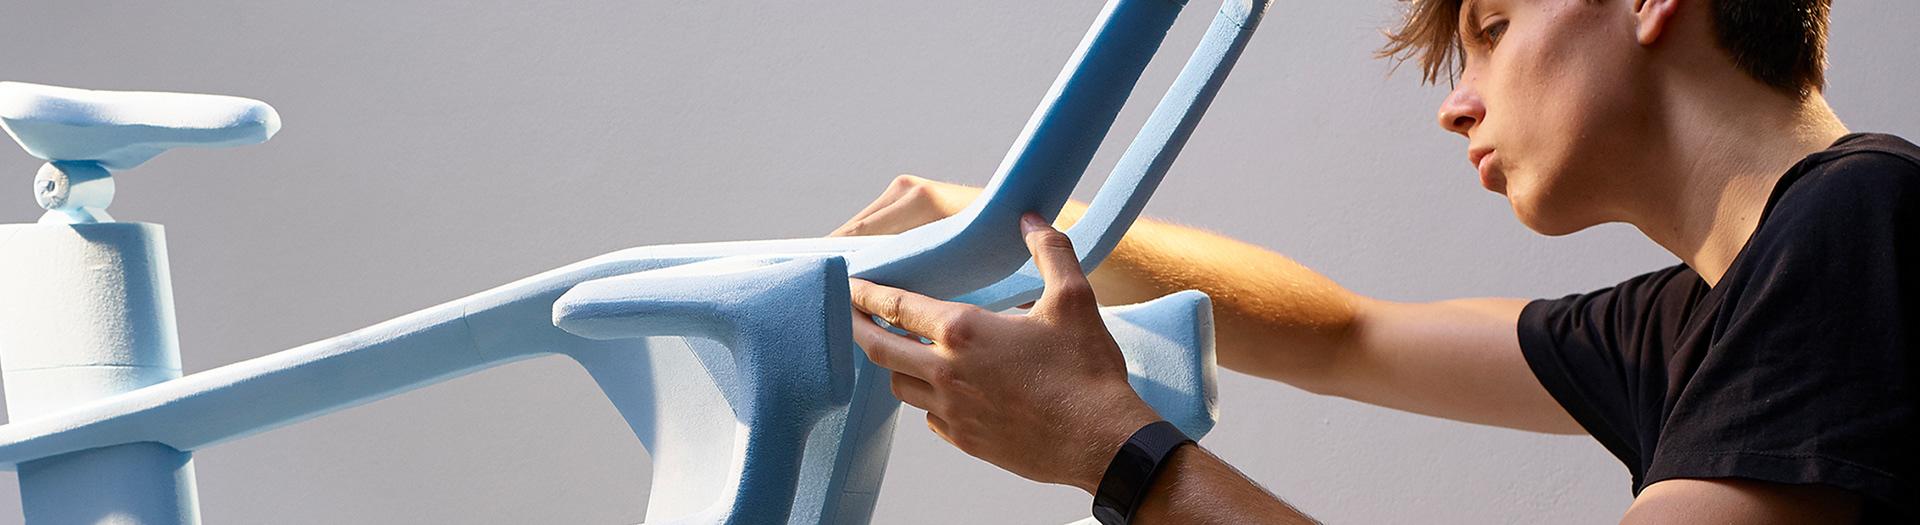 Curventa - crafting - blue foam modelling - prototype - craftsmanship - form exploration